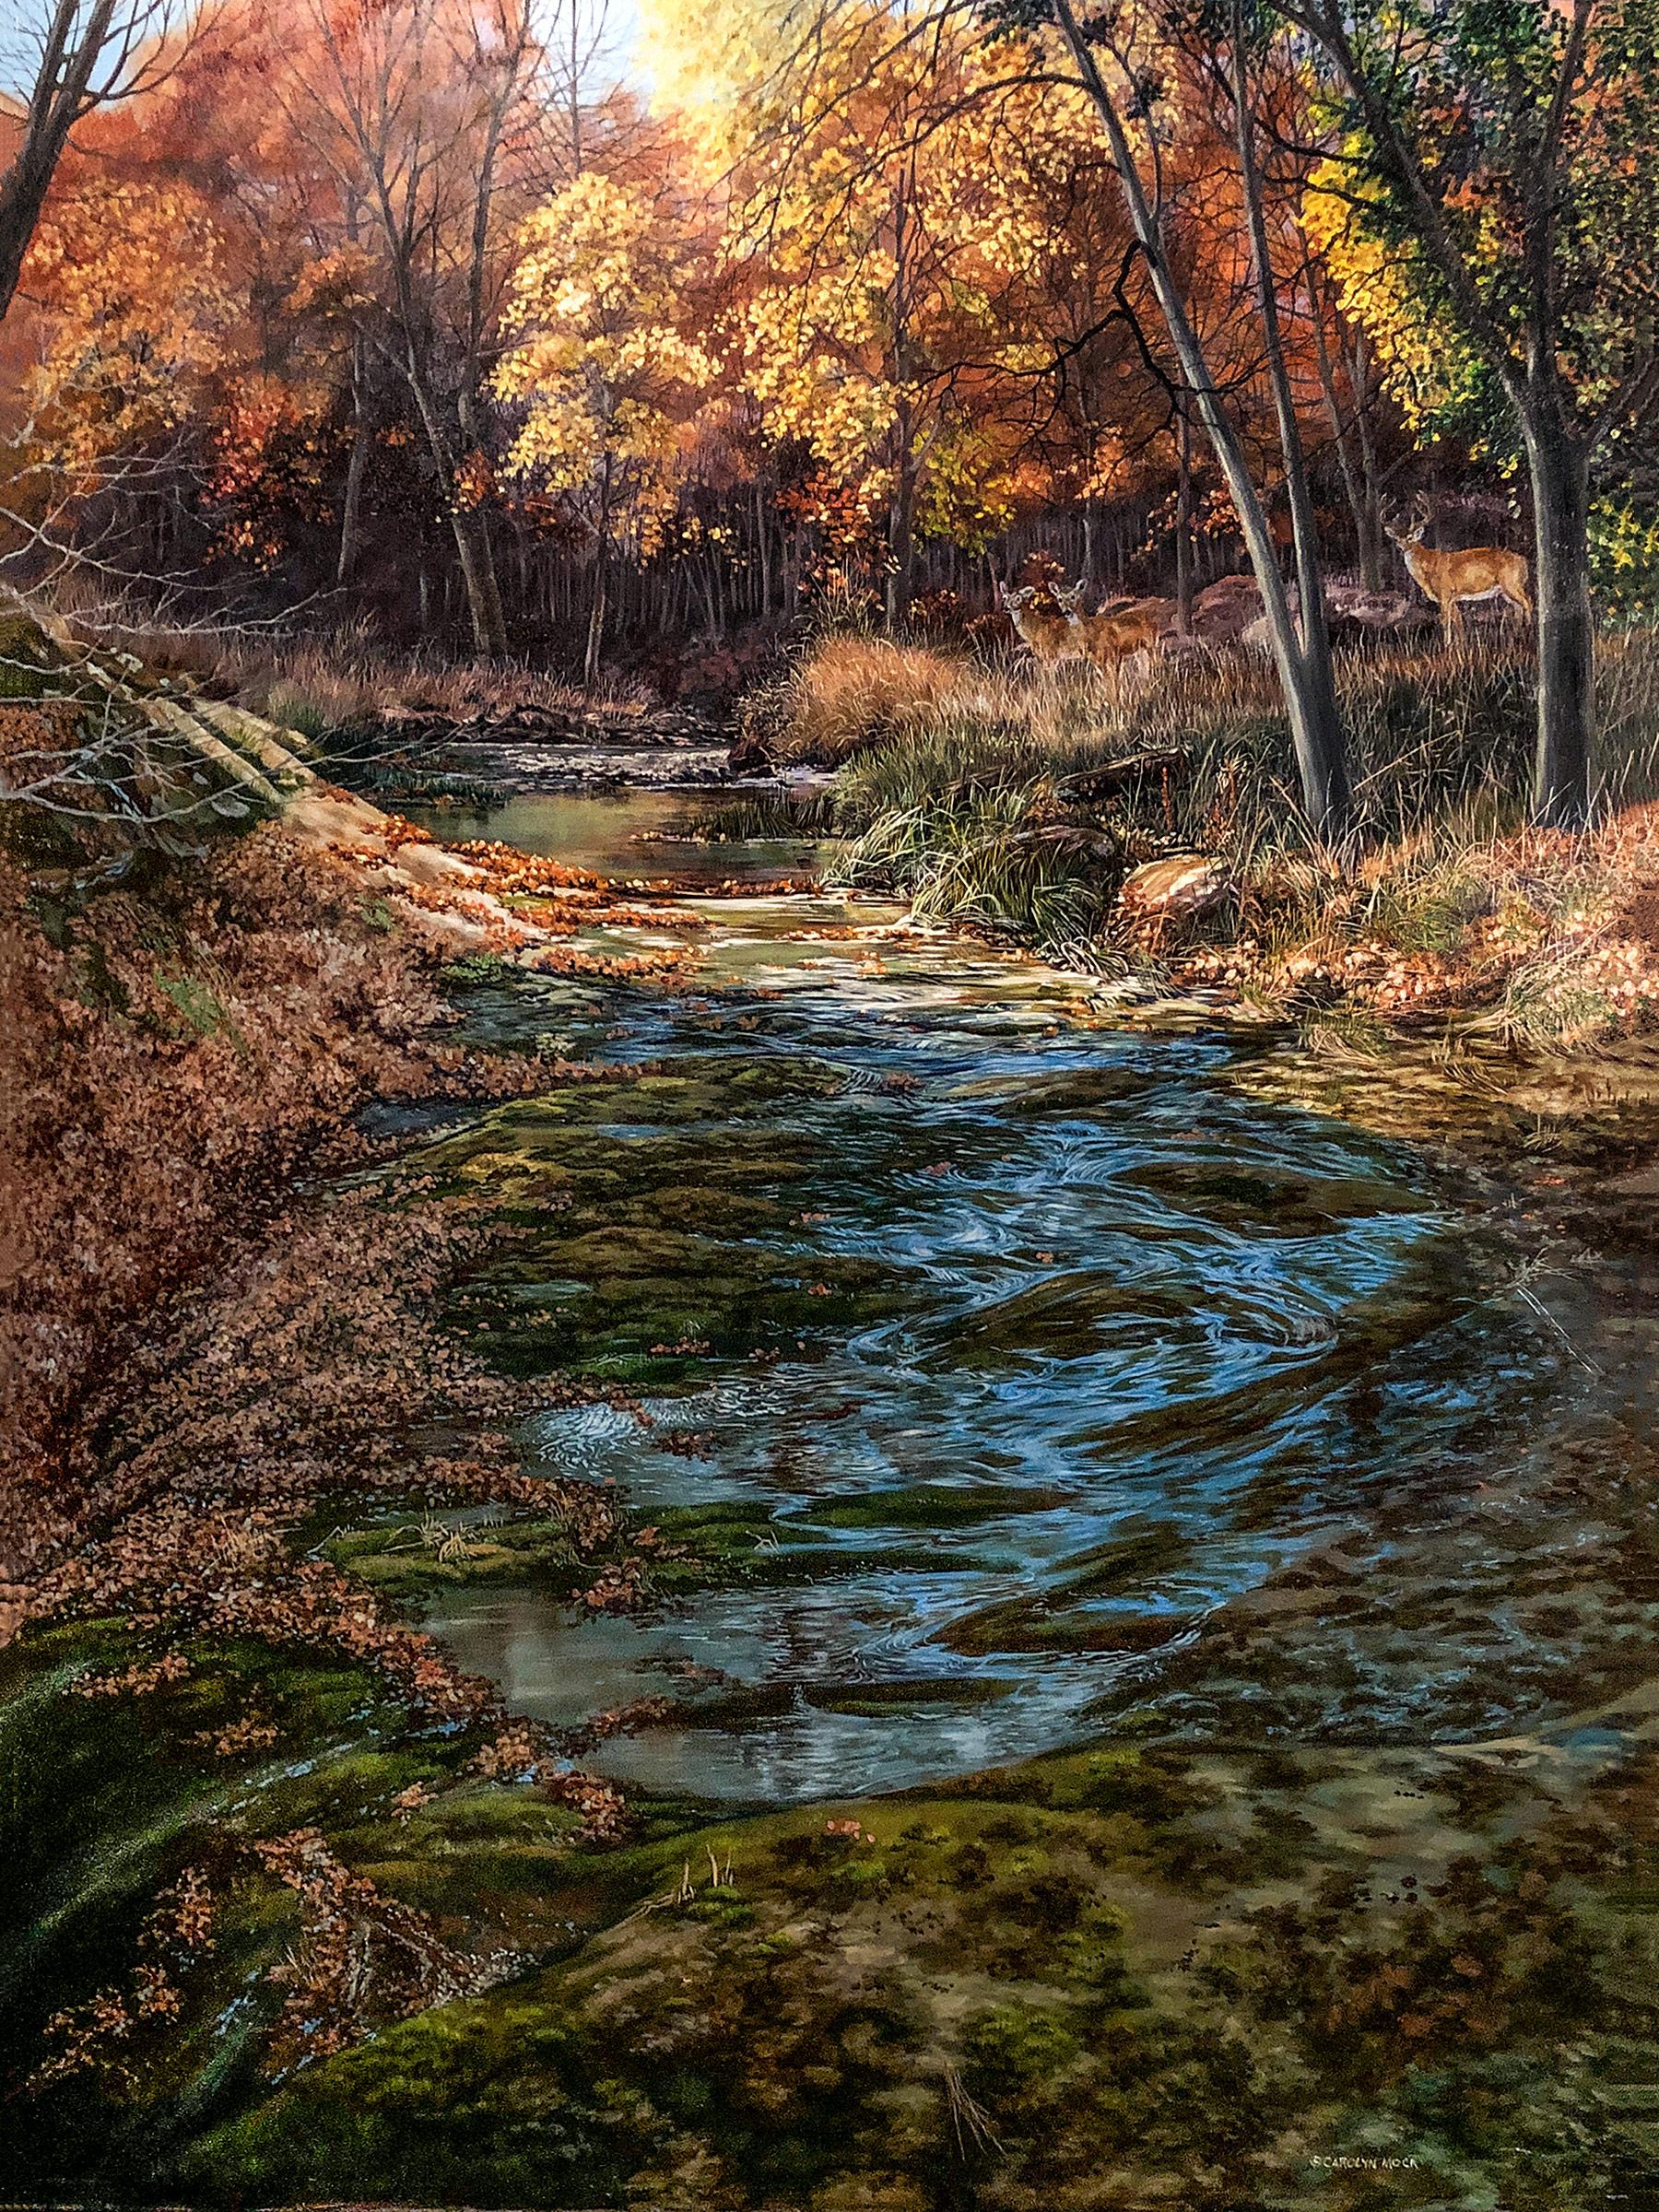 A stream runs through a field as the leaves begin to change